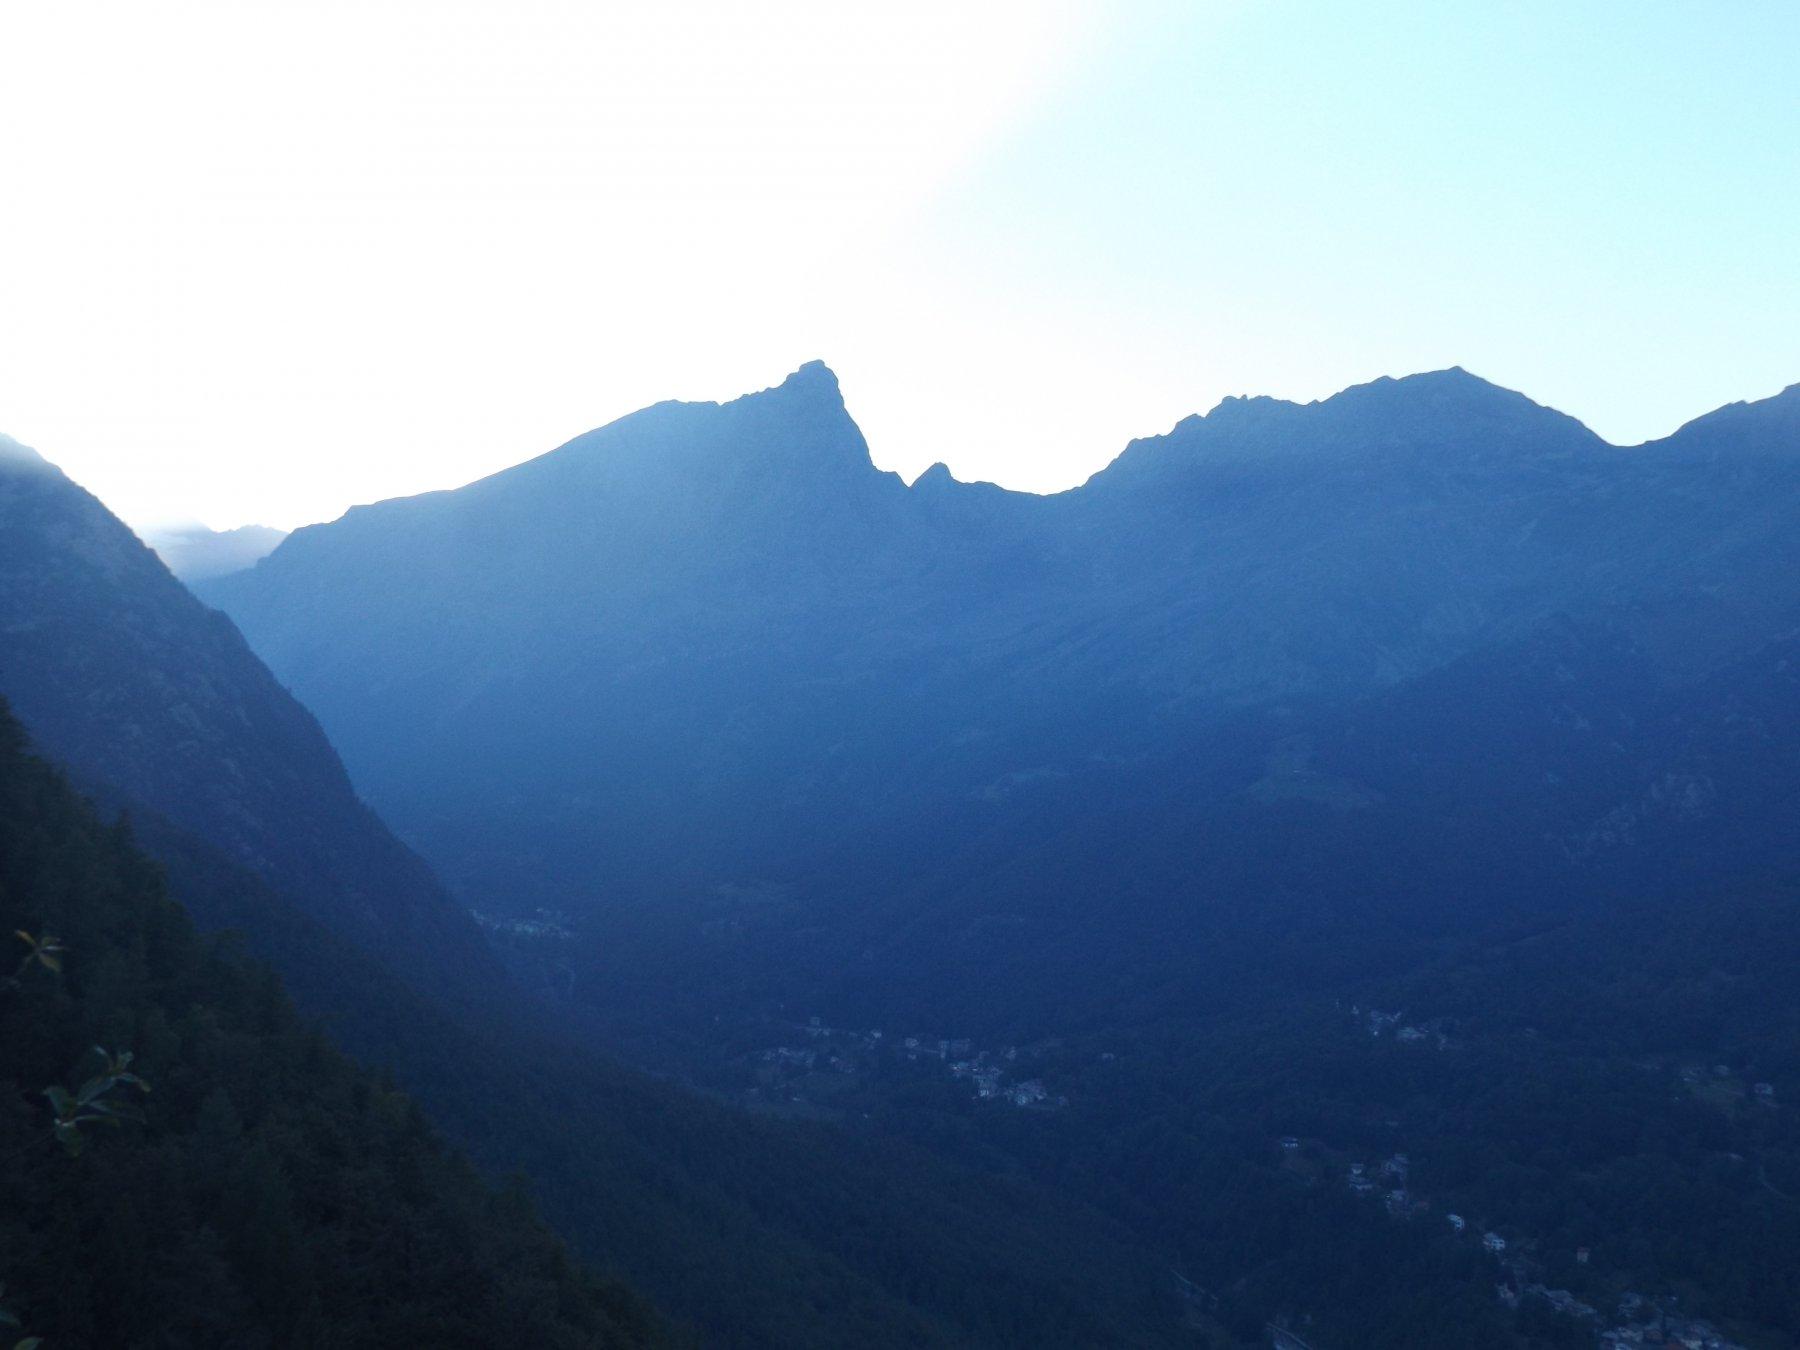 Nona (Rocca di) da Ala di Stura 2016-08-25